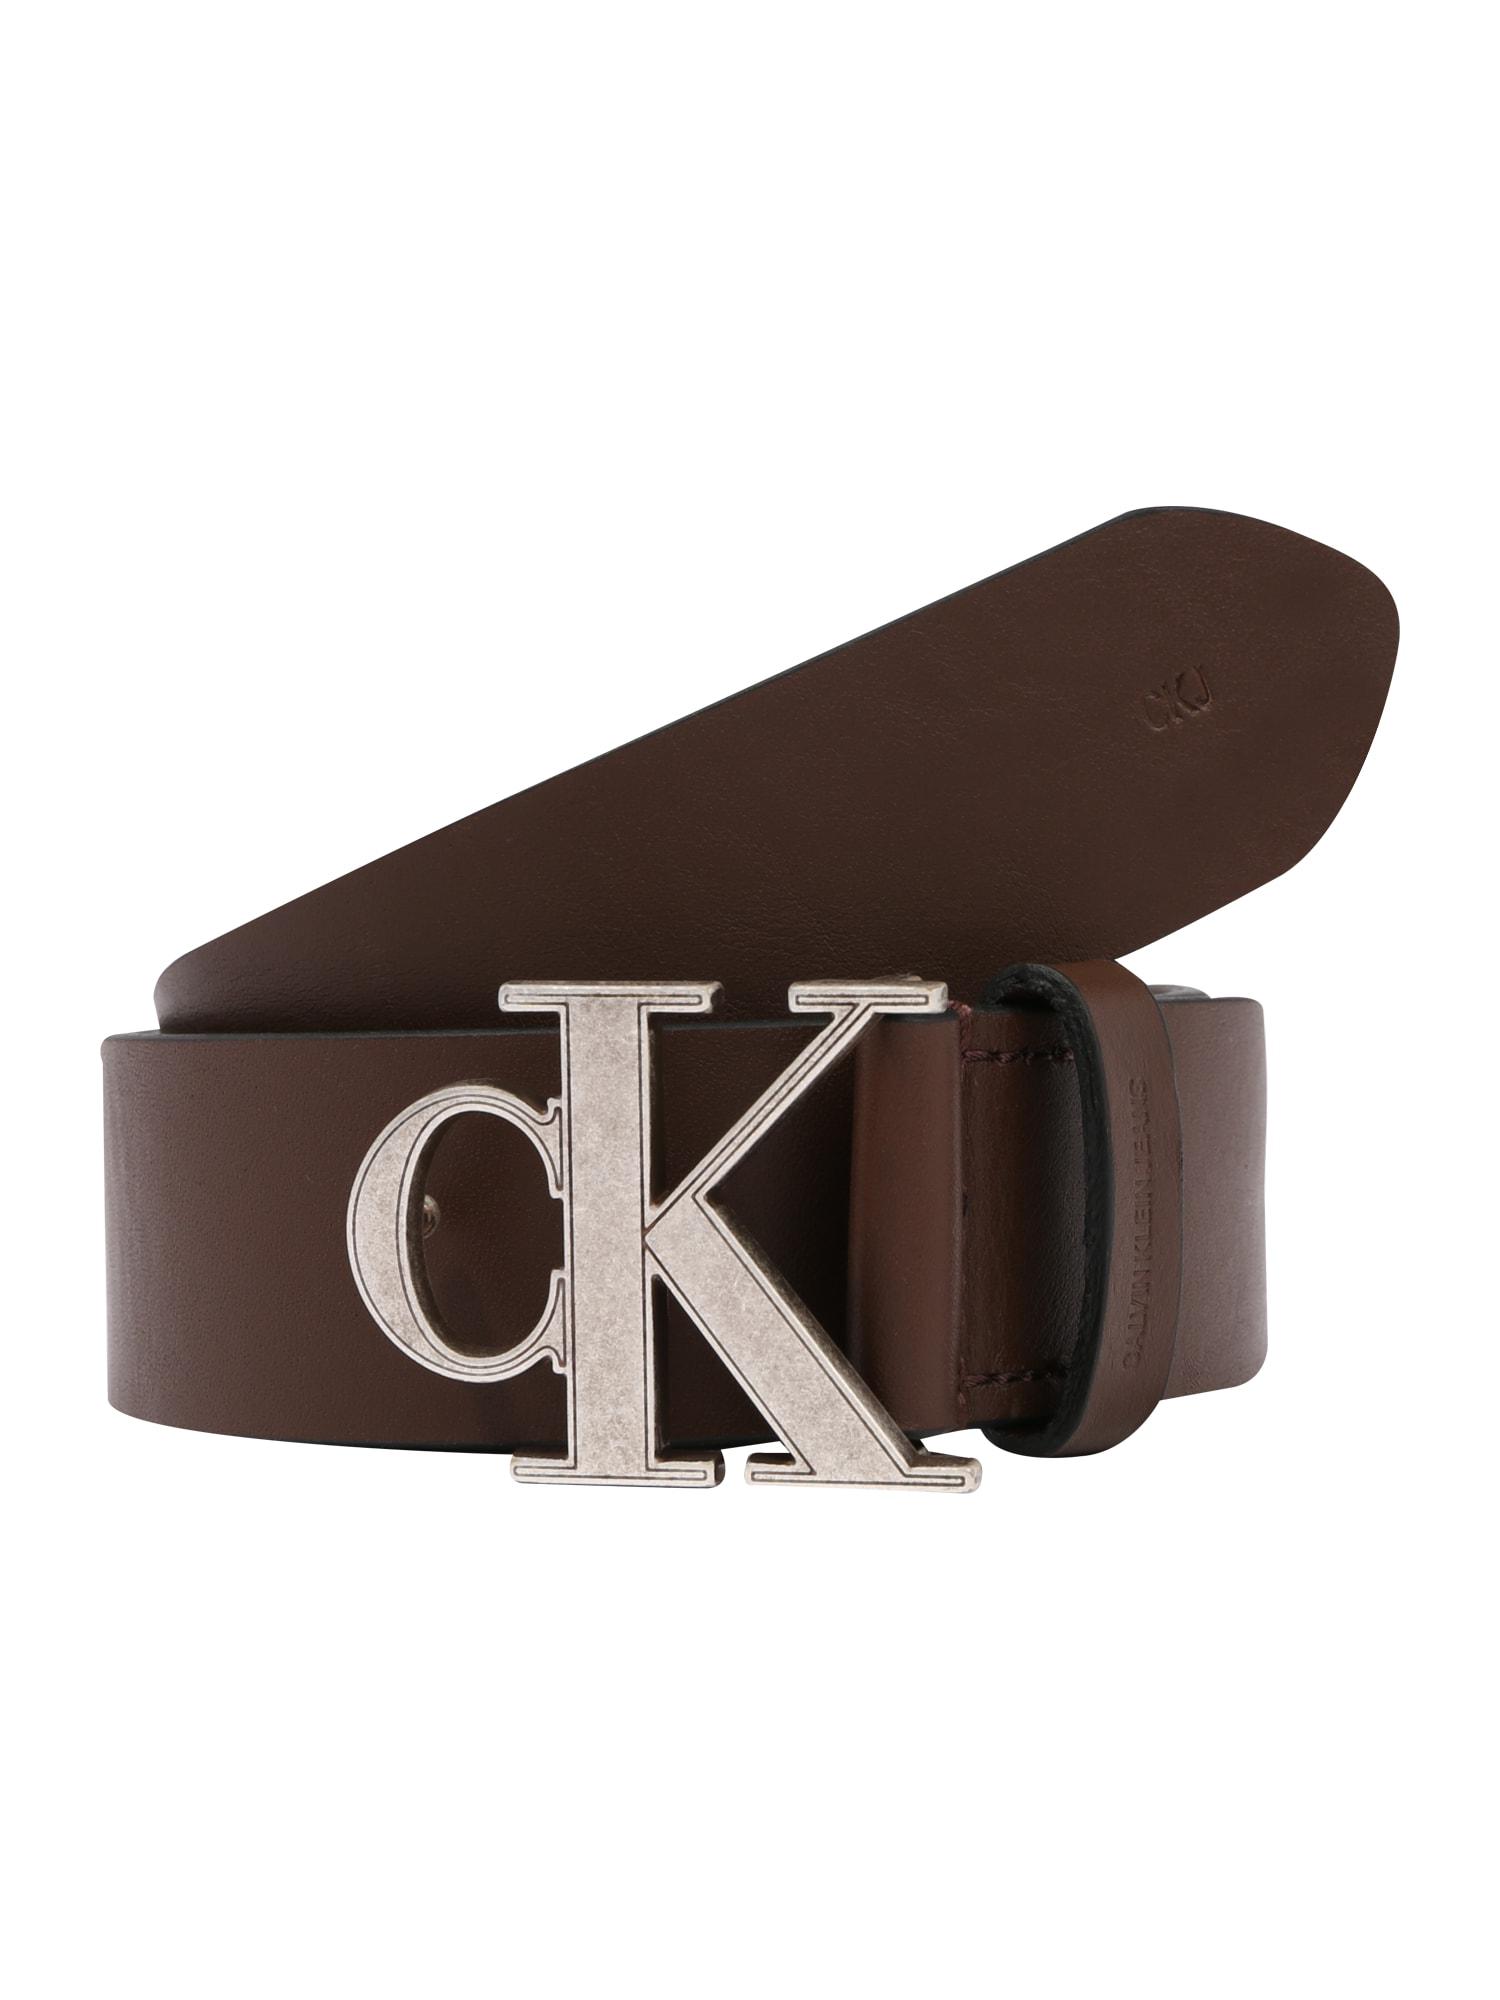 Calvin Klein Jeans Opasky 'CKJ MONO HARDWARE 35MM'  hnedé